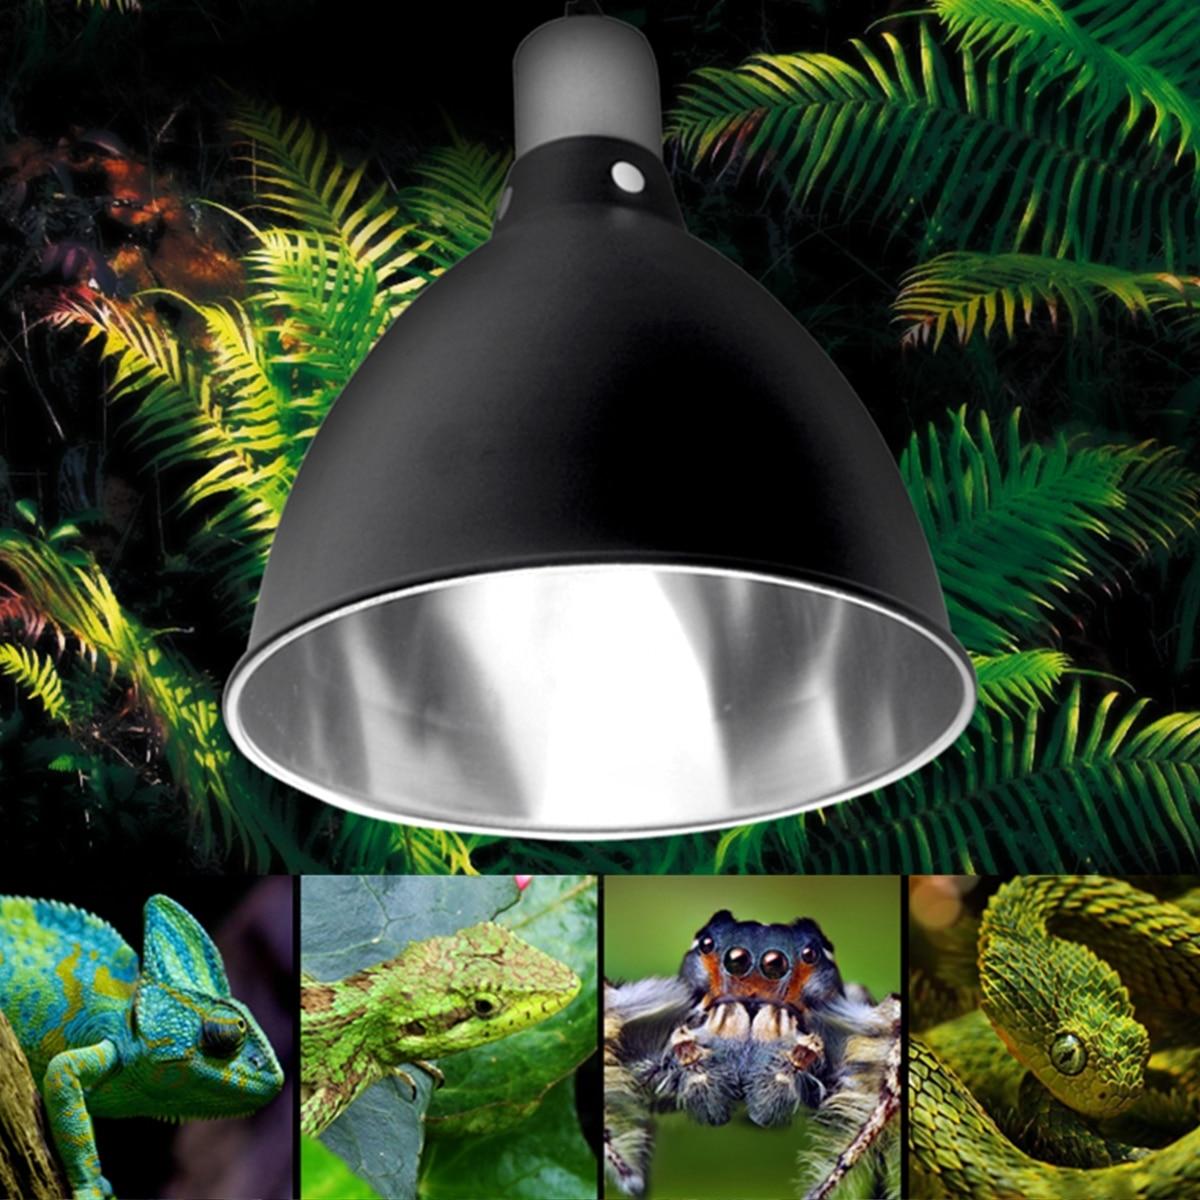 E27 Ceramic Heat UV UVB Lamp Light Holder For Aquarium Amphibians Reptile Tortoise Lampshade with SwitchE27 Ceramic Heat UV UVB Lamp Light Holder For Aquarium Amphibians Reptile Tortoise Lampshade with Switch